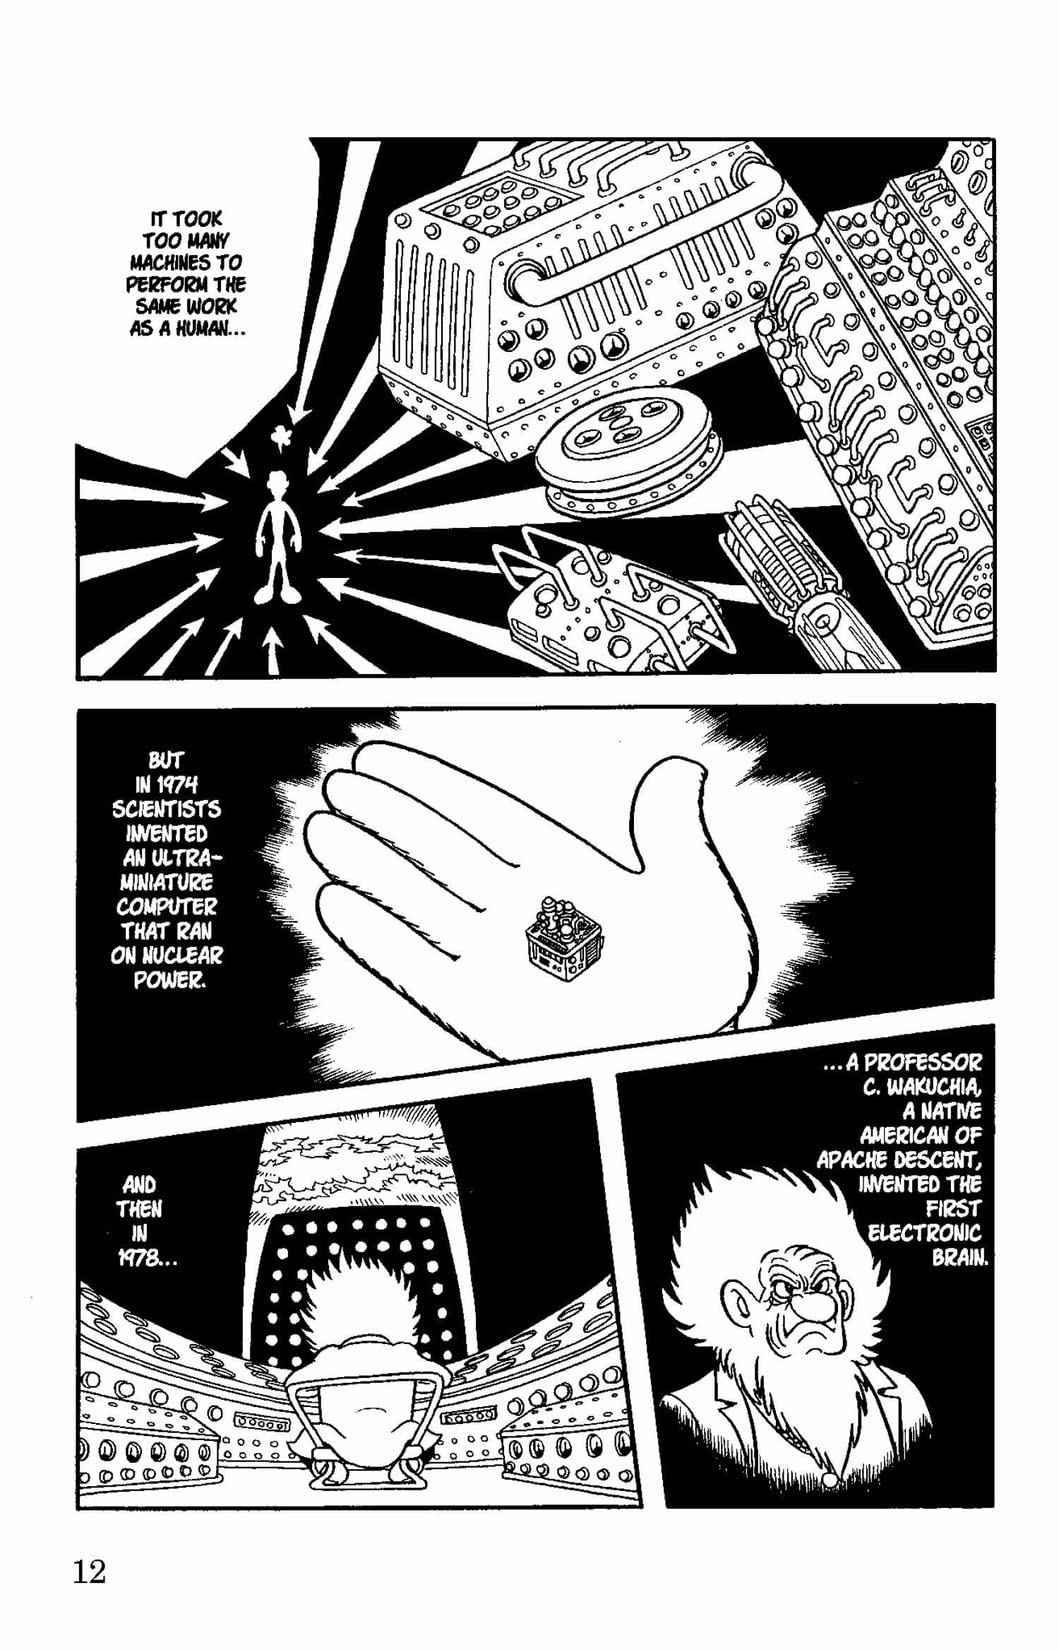 Astro Boy Volume 1 & 2